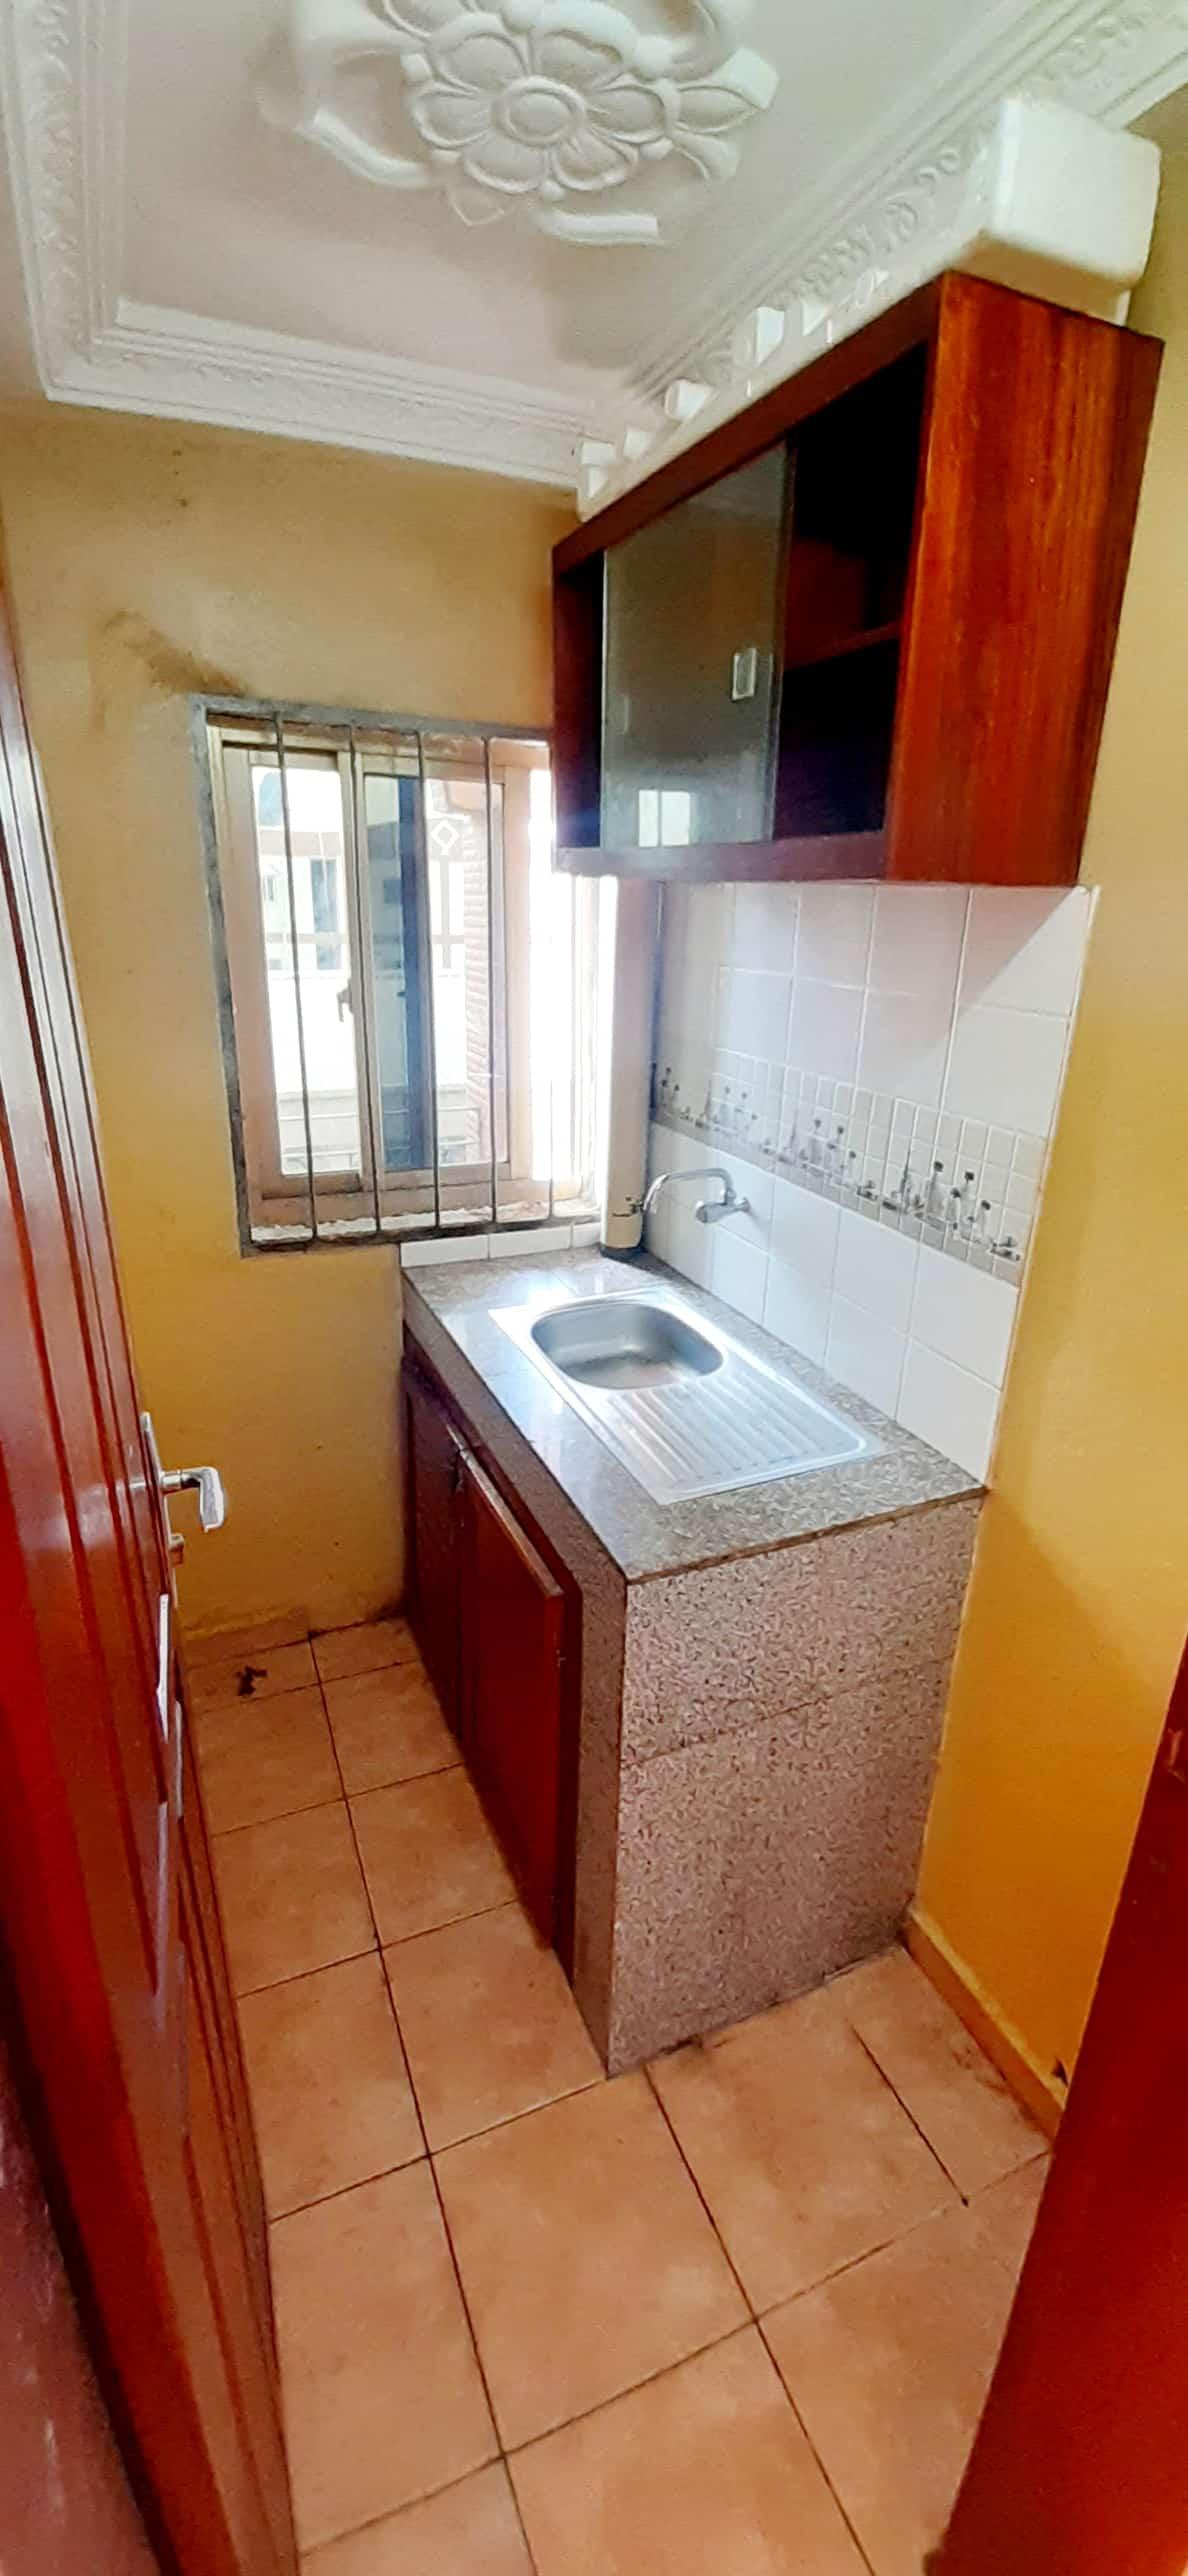 Studio to rent - Douala, Akwa I, Kotto Chefferie - 80 FCFA / month